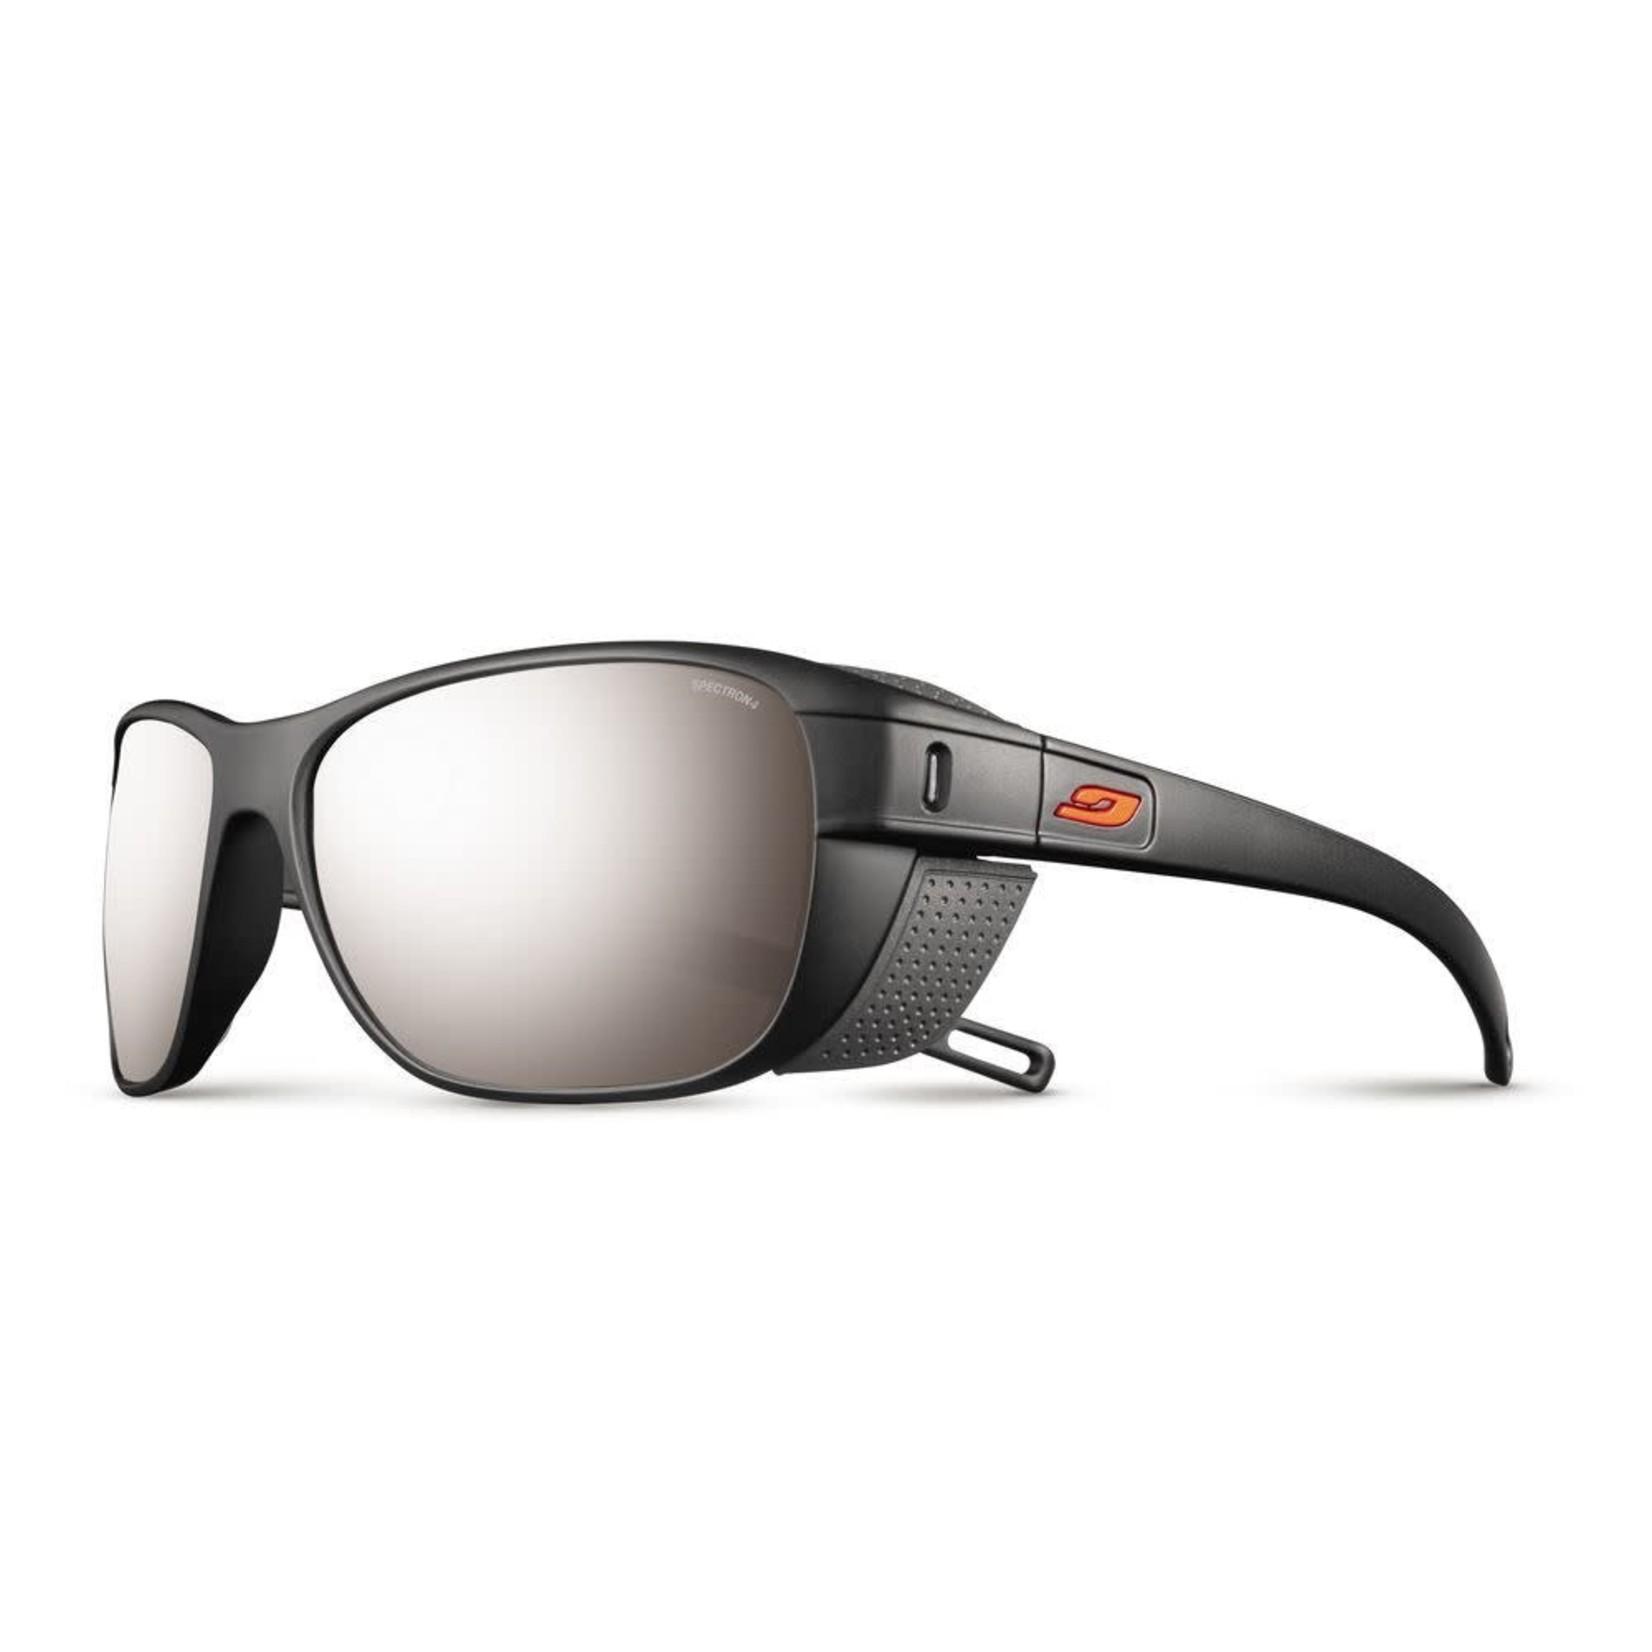 Julbo Julbo Camino Sunglasses - Unisex